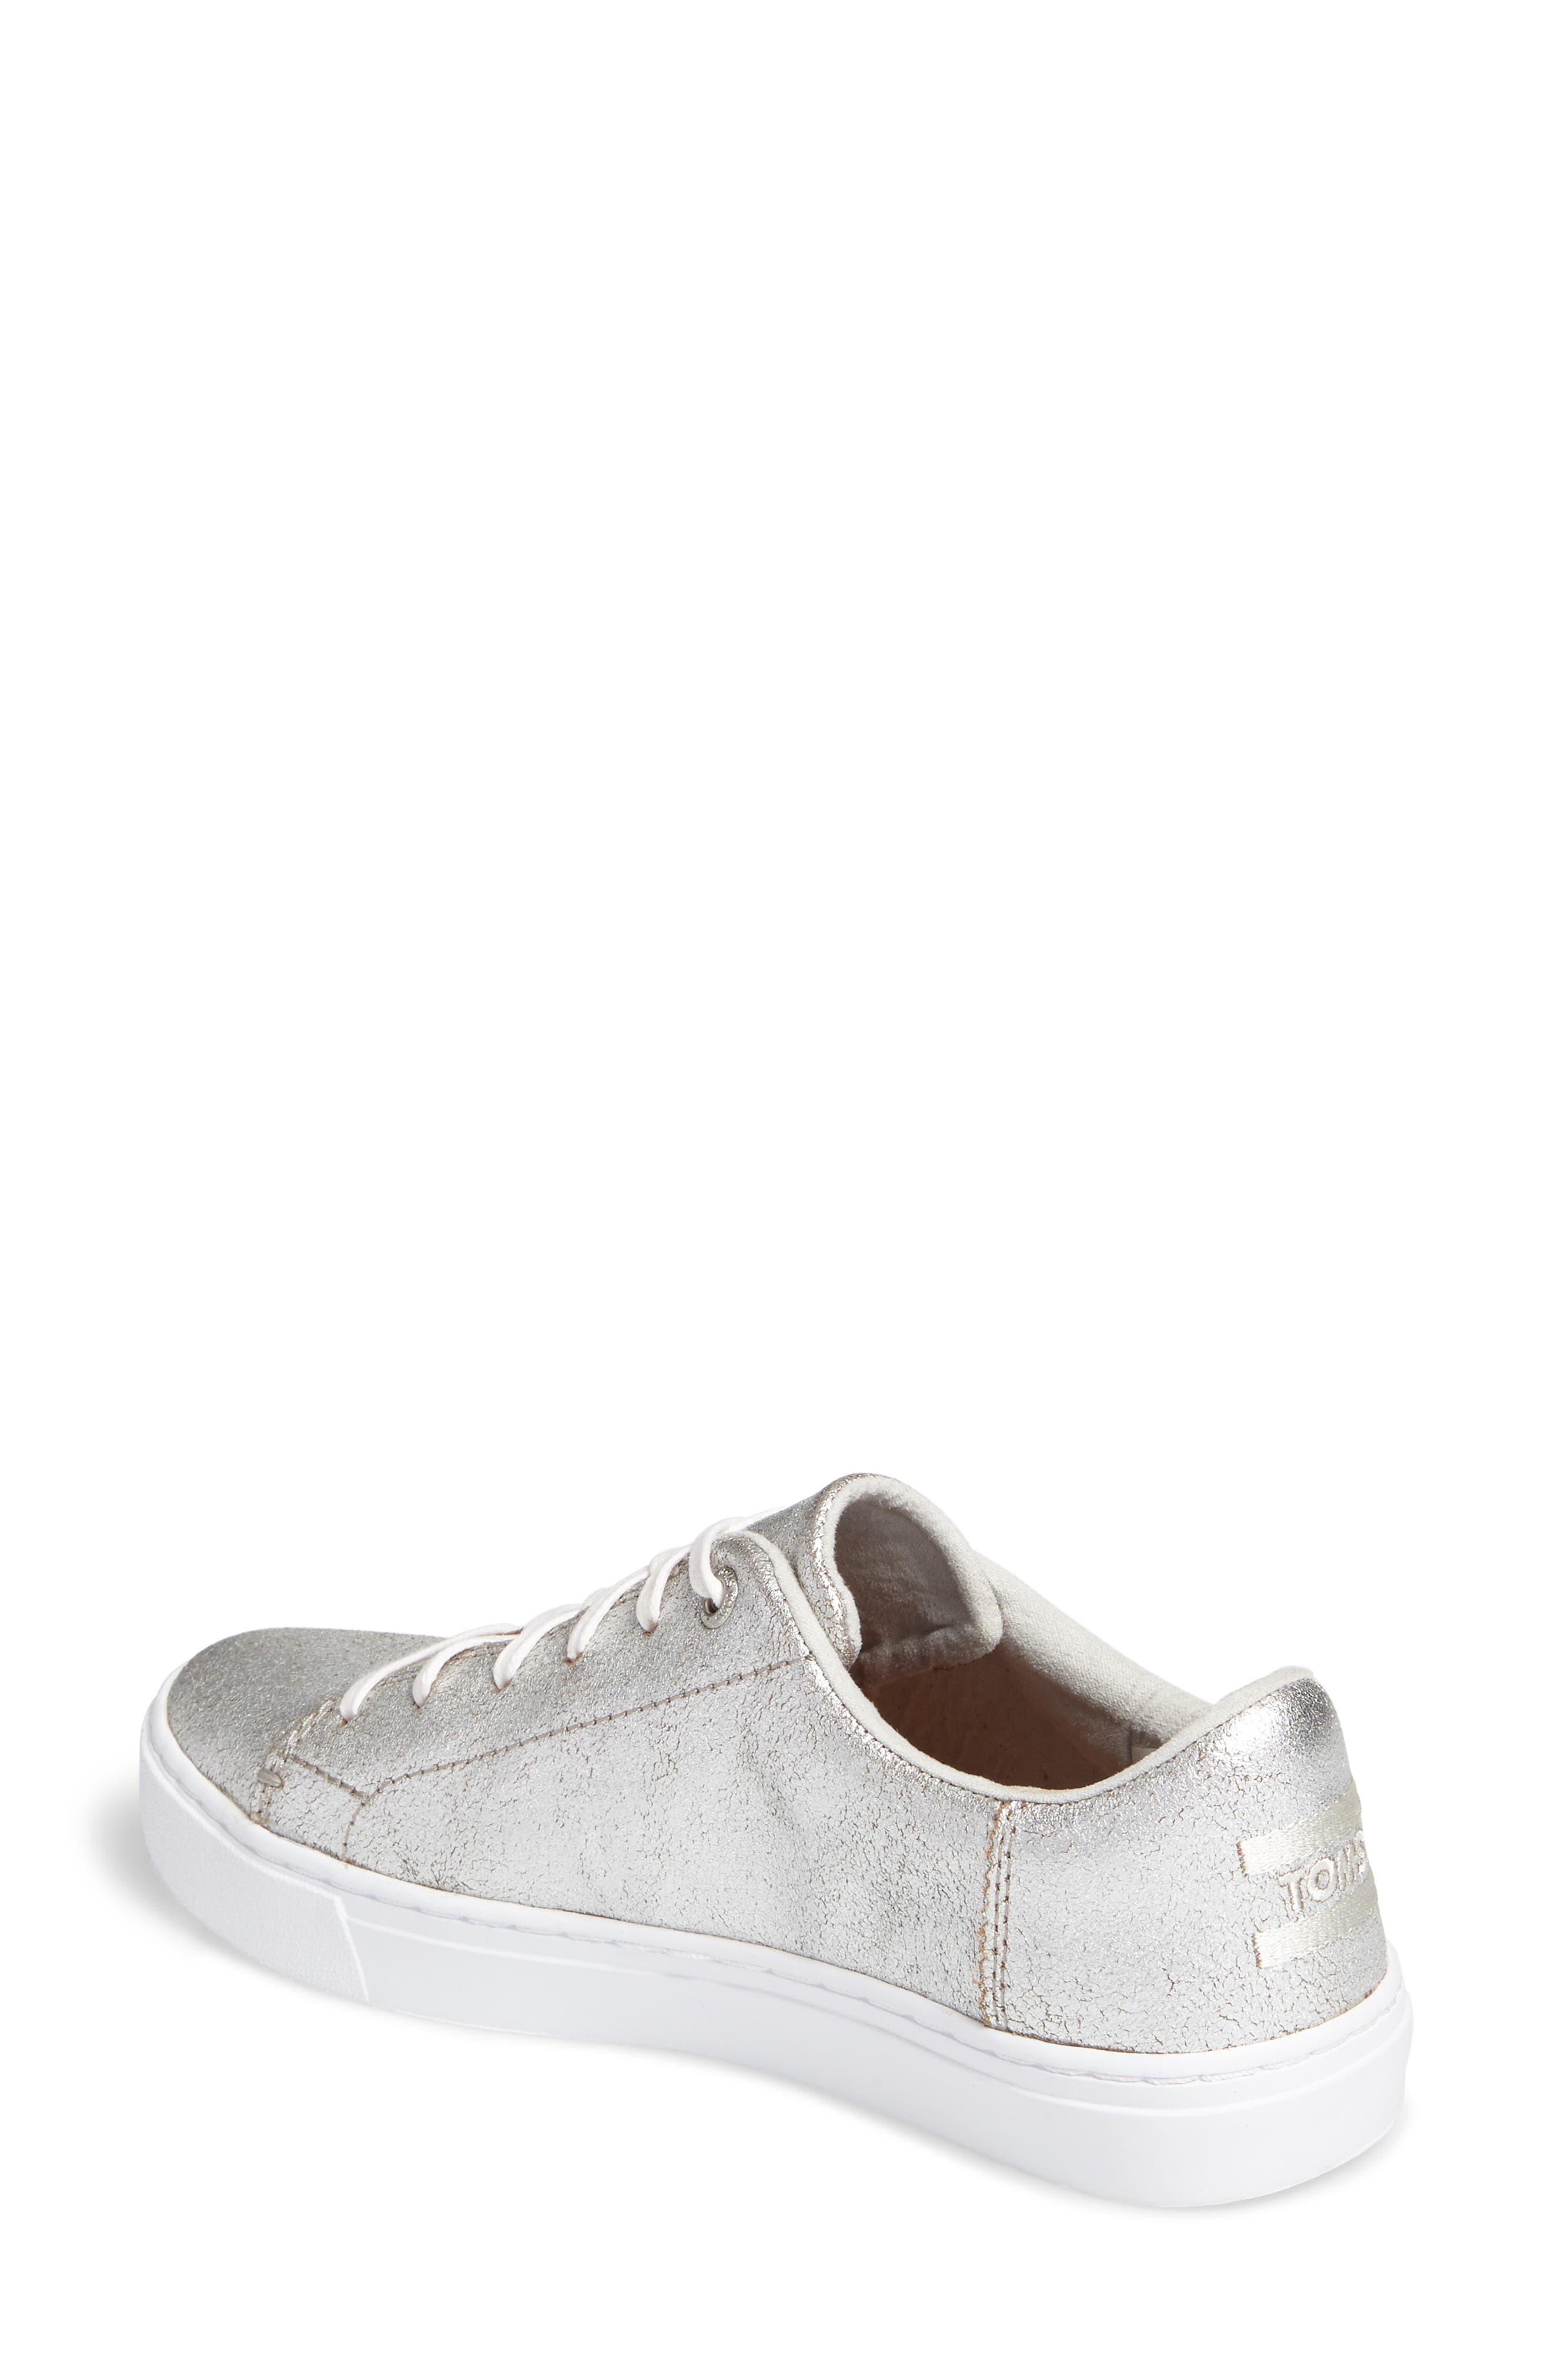 Lenox Sneaker,                             Alternate thumbnail 21, color,